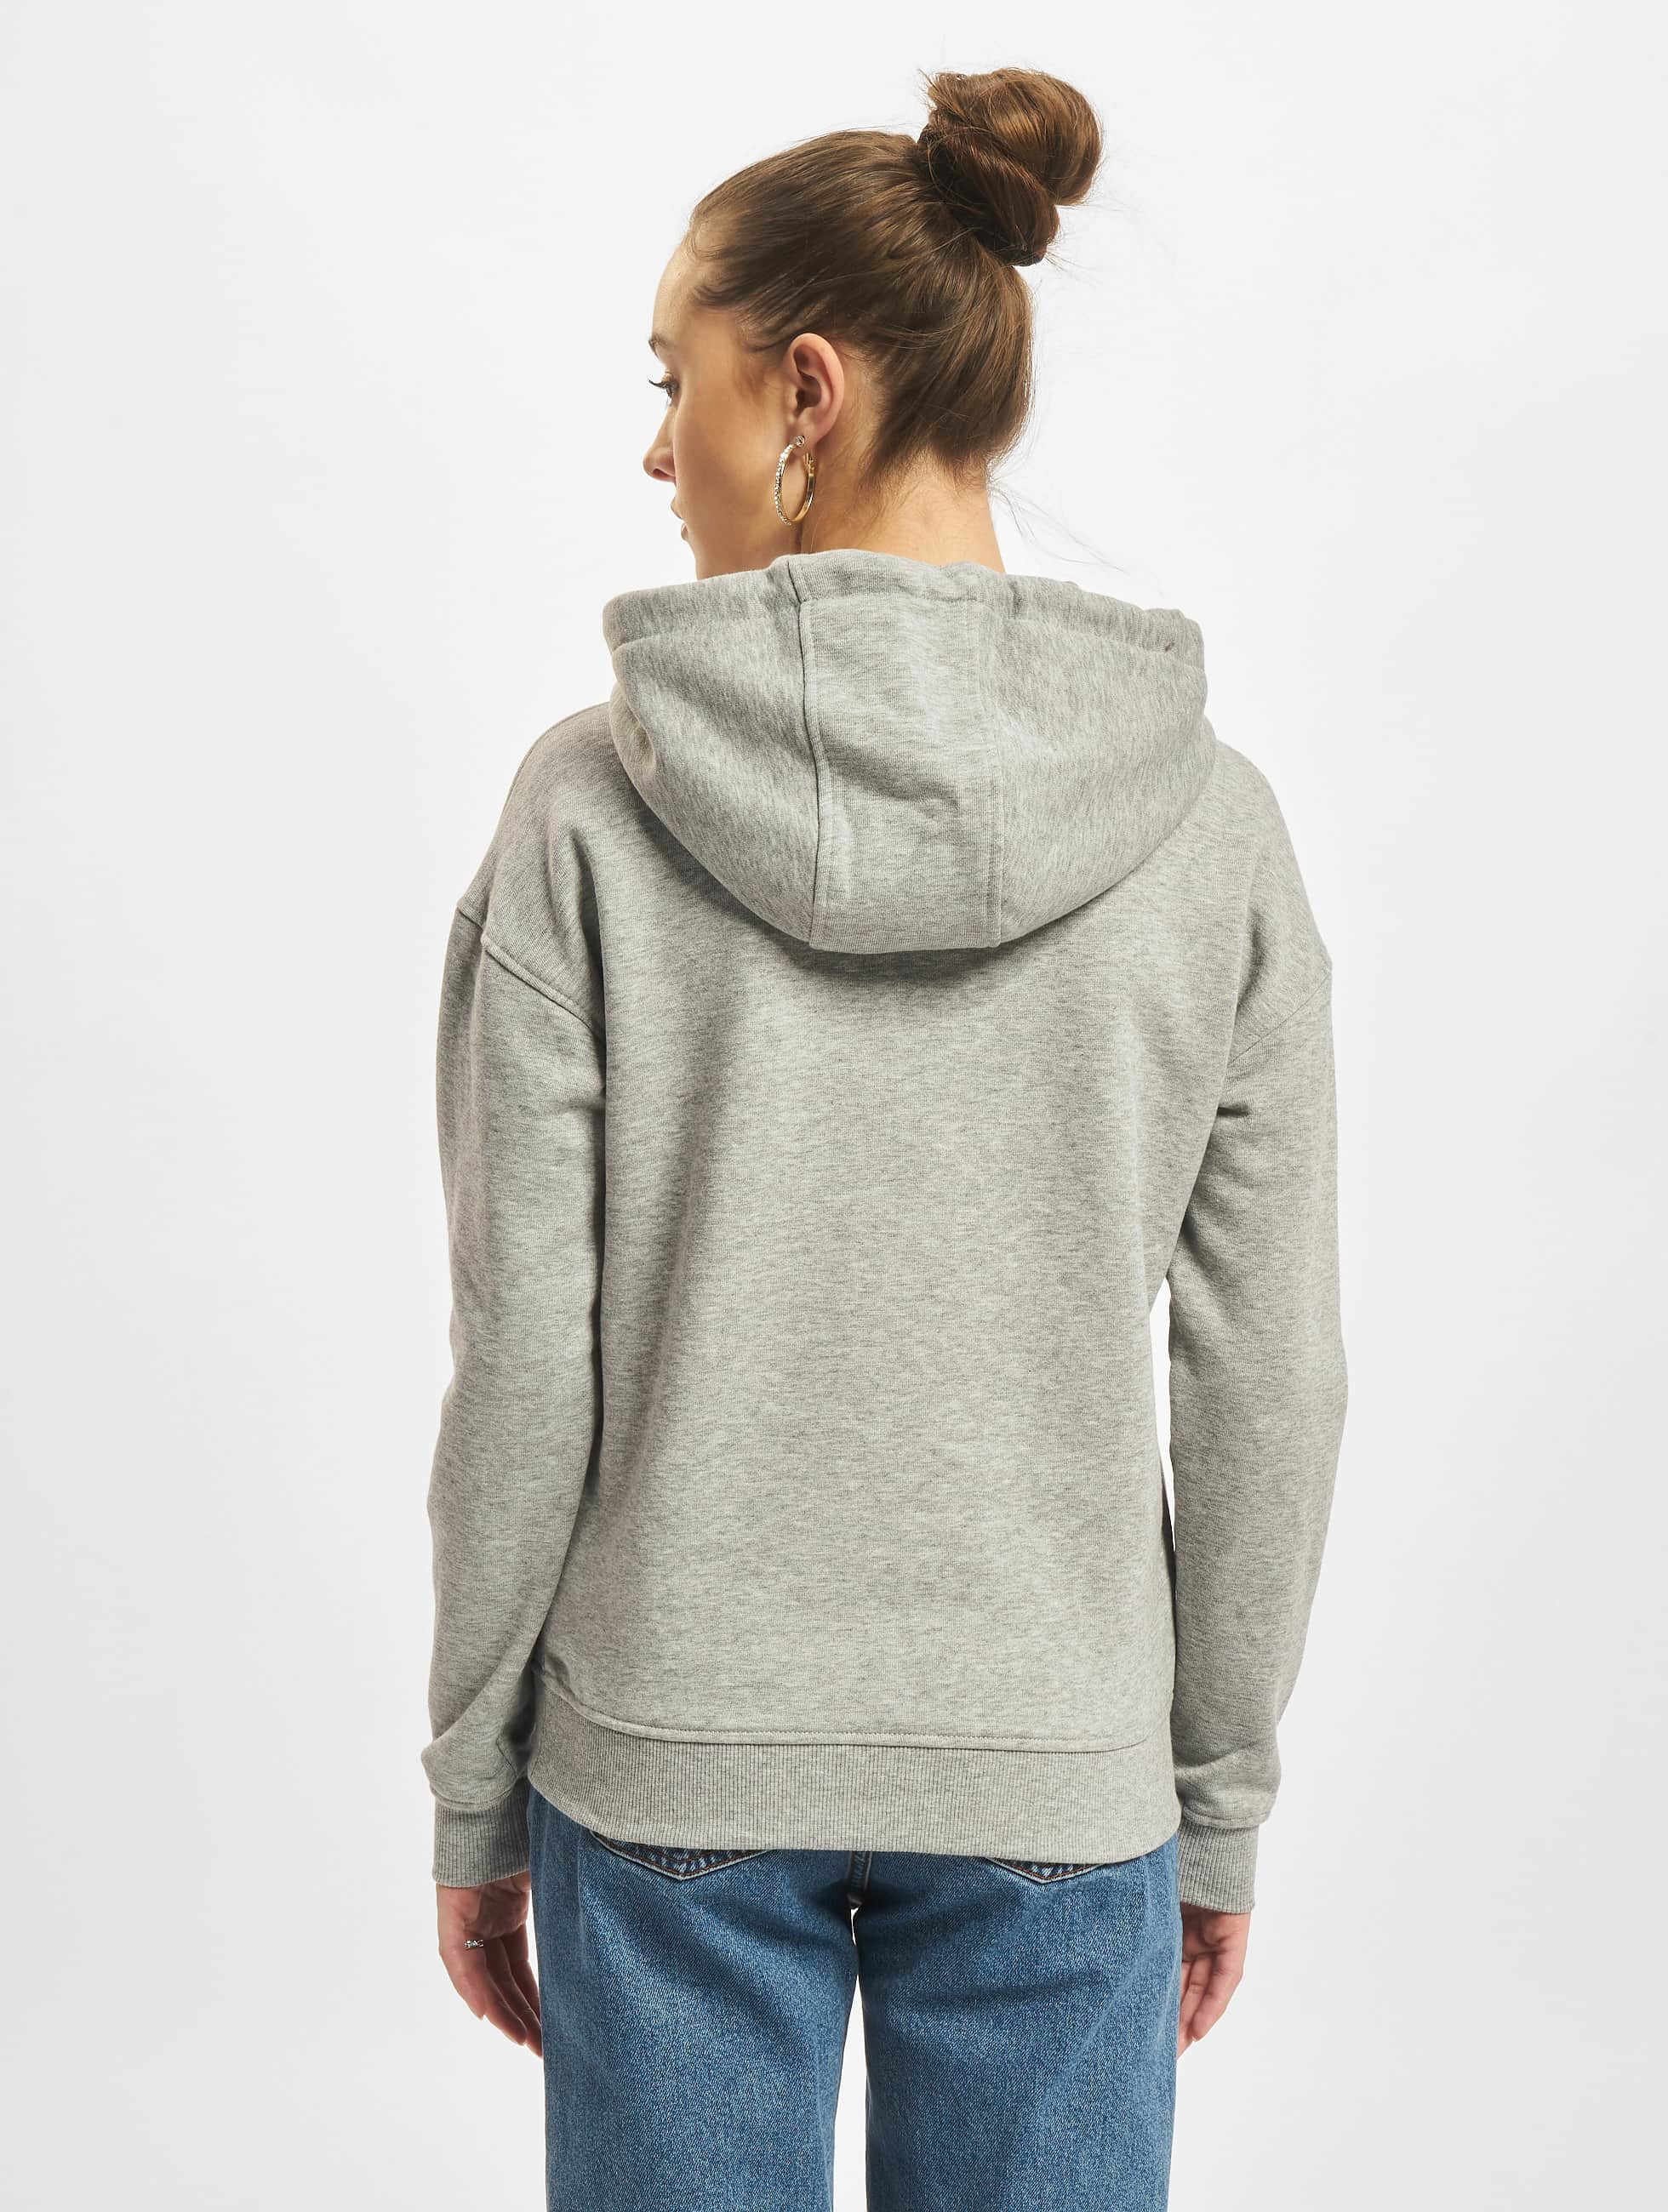 Urban Classics Hoodie Ladies grey